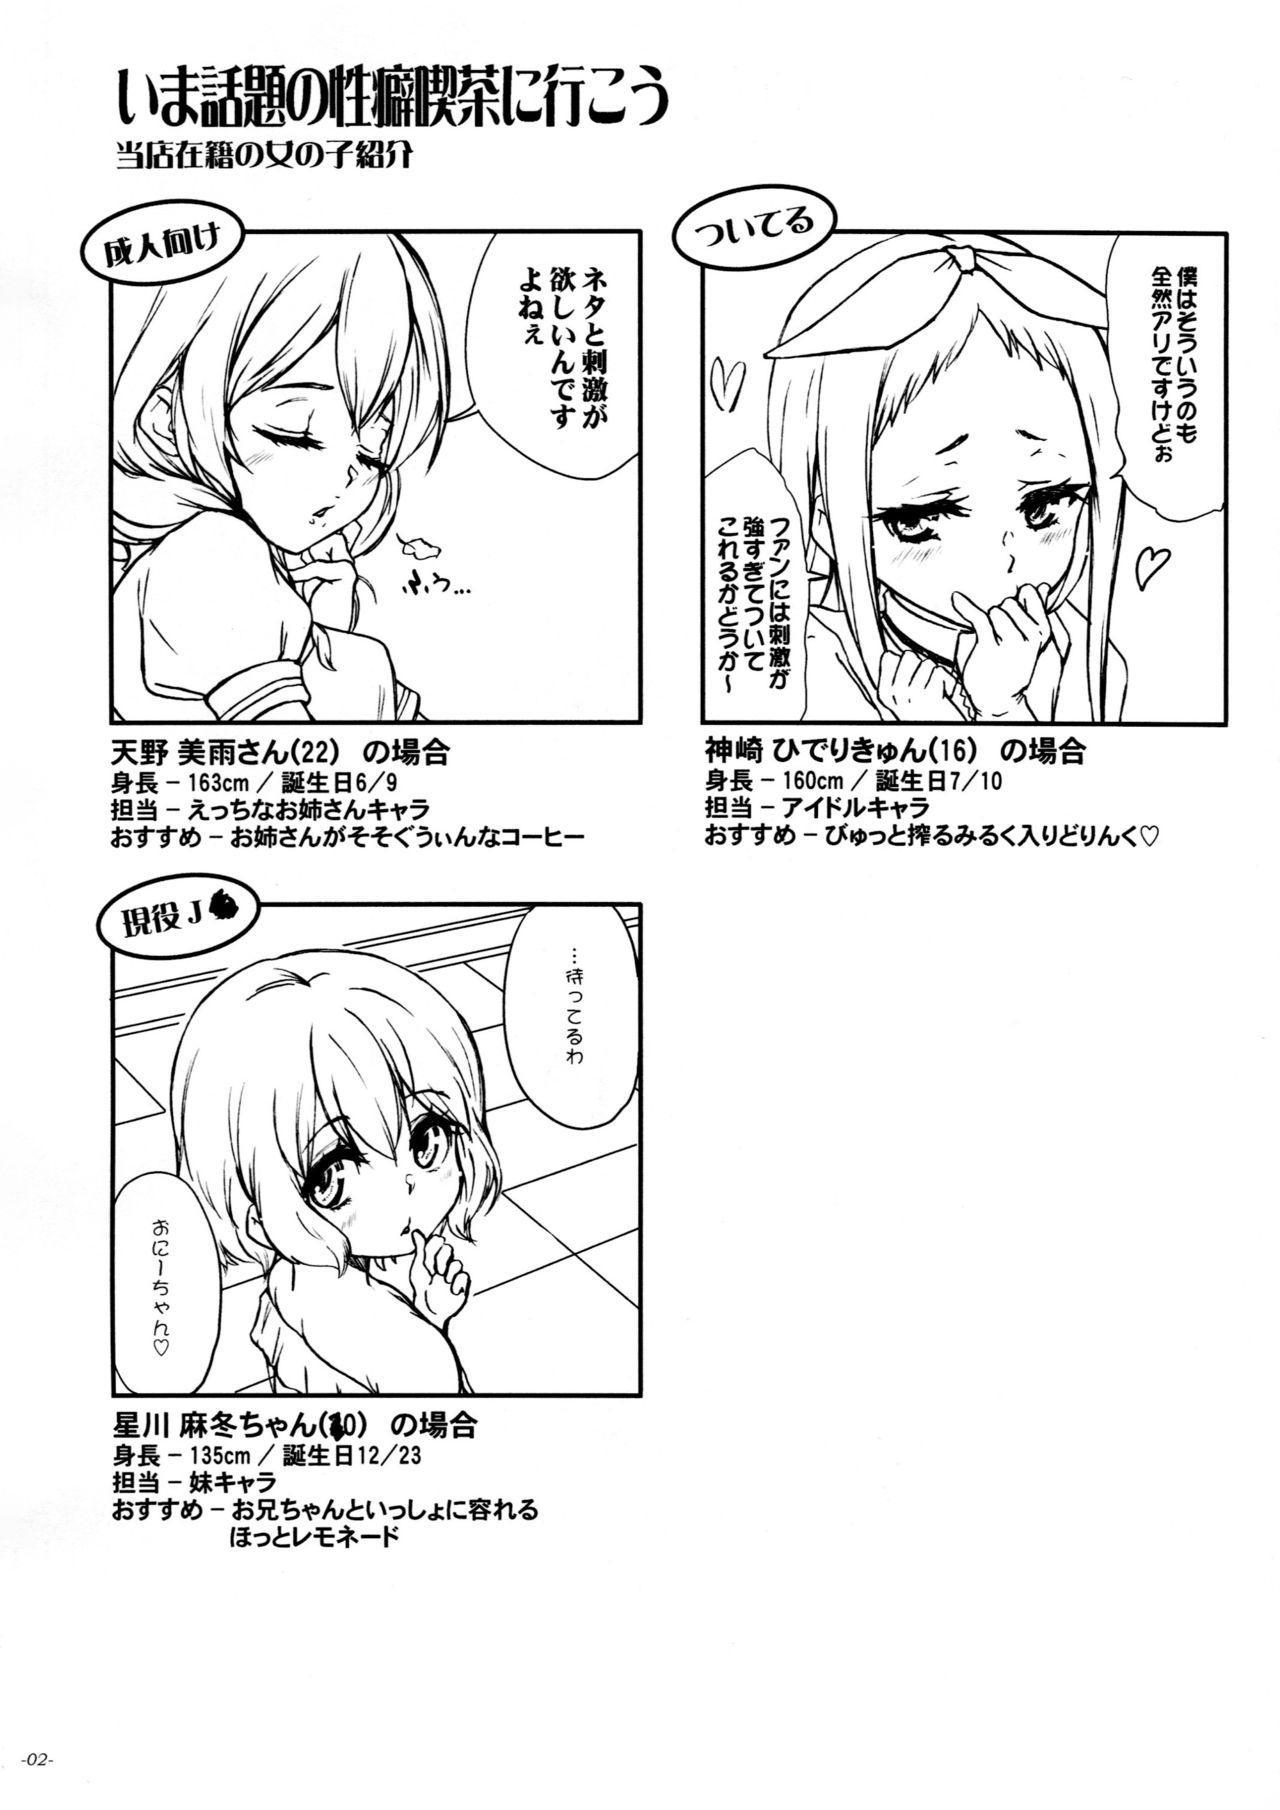 (C93) [Sekai Kakumei Club (Ozawa Reido)] Otou-san, Okaa-san, Ikagawashii Omise de Gomennasai. (Blend S) 2